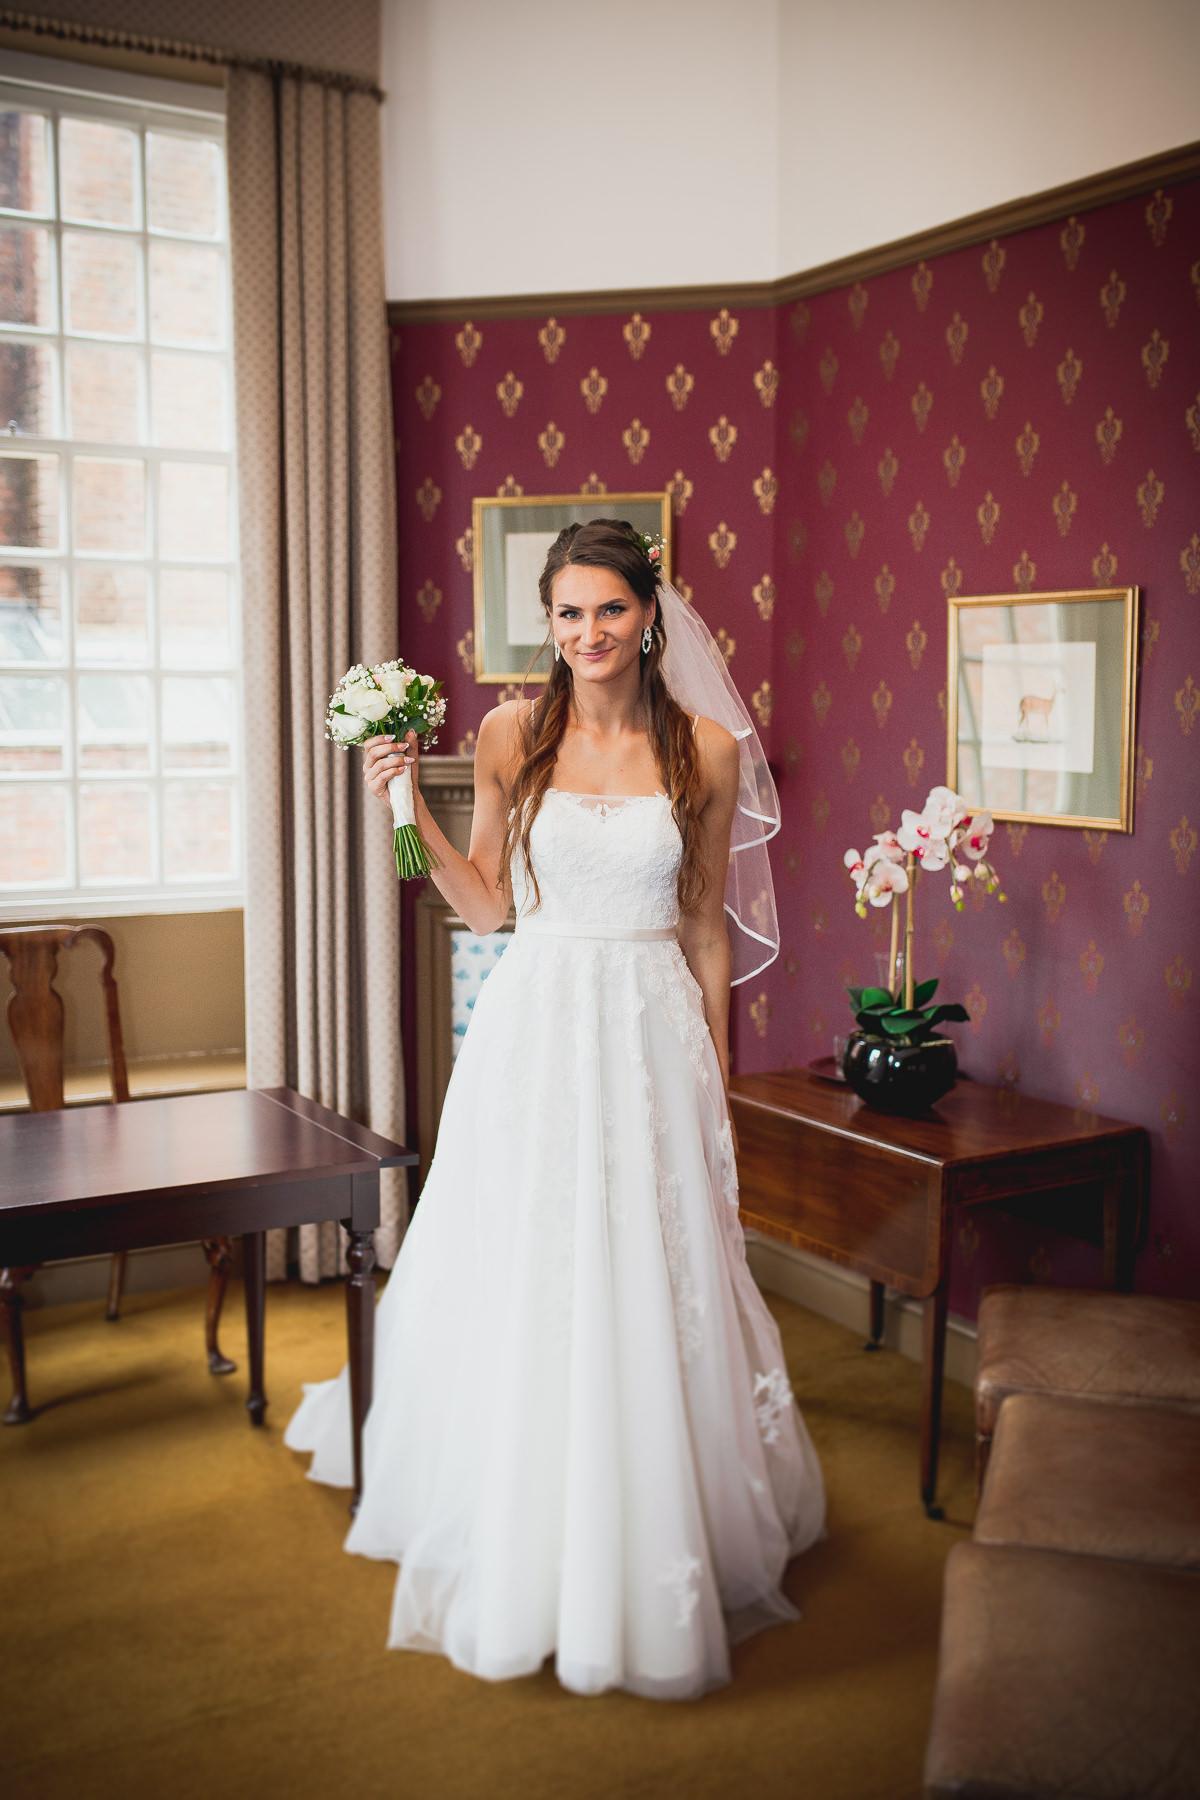 Bride West Sussex Weddings Chichester Town Hall